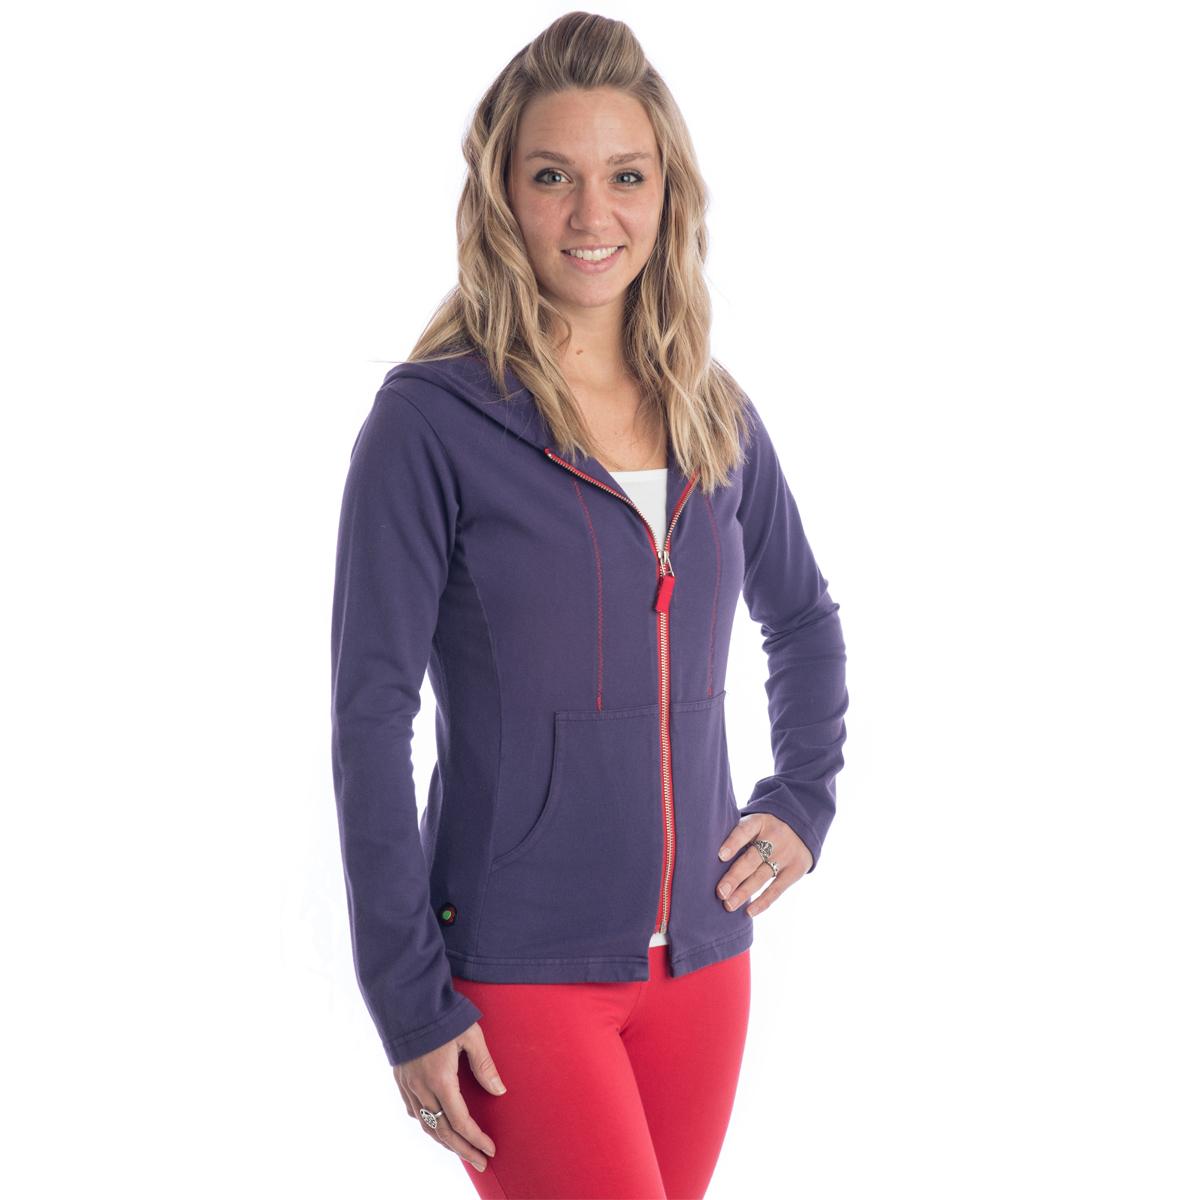 Beckons Organic Strength Zipper Hoodie Yoga Direct